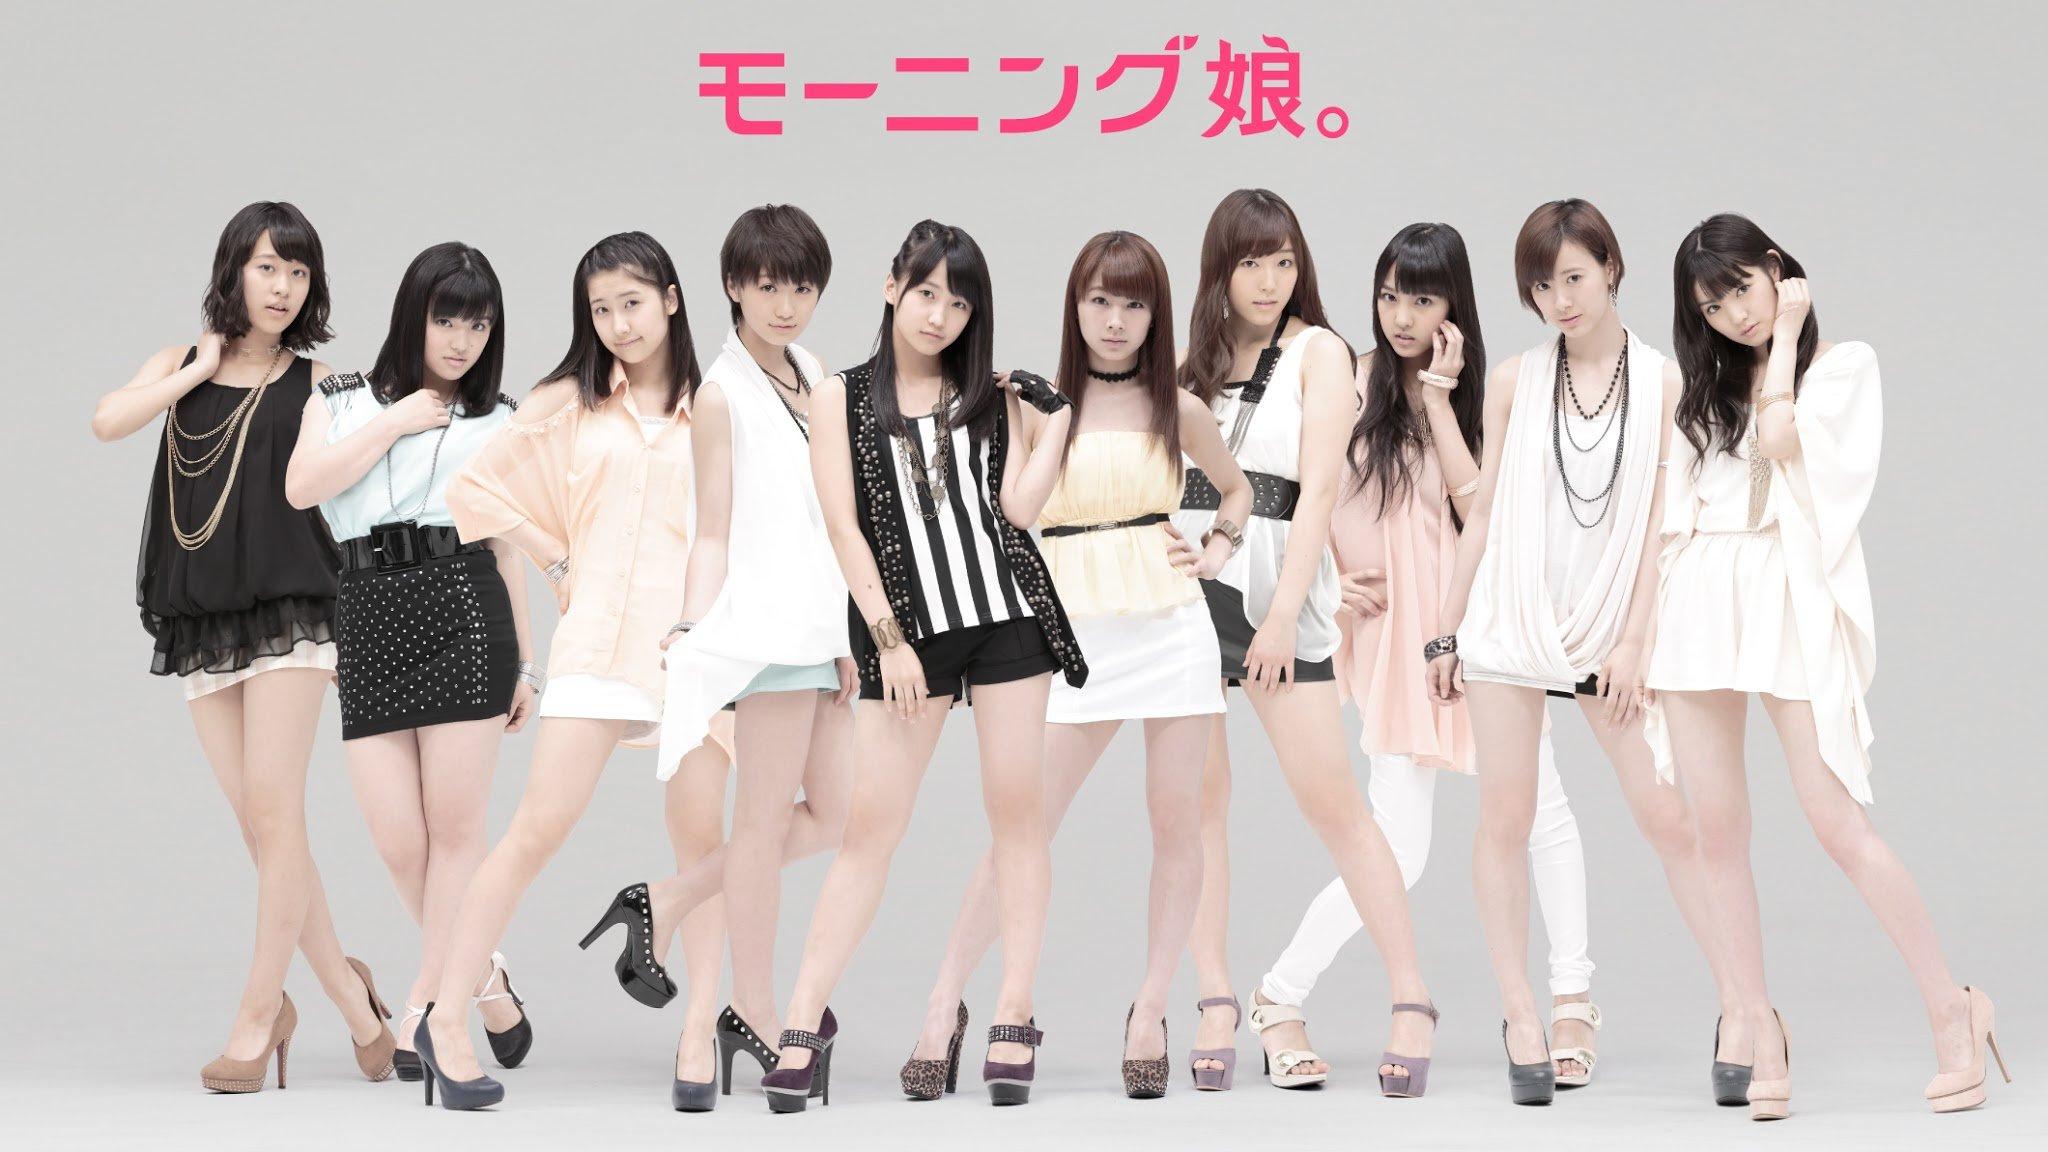 Morning Musume Wallpaper Morning Musume Wallpaper 36164713